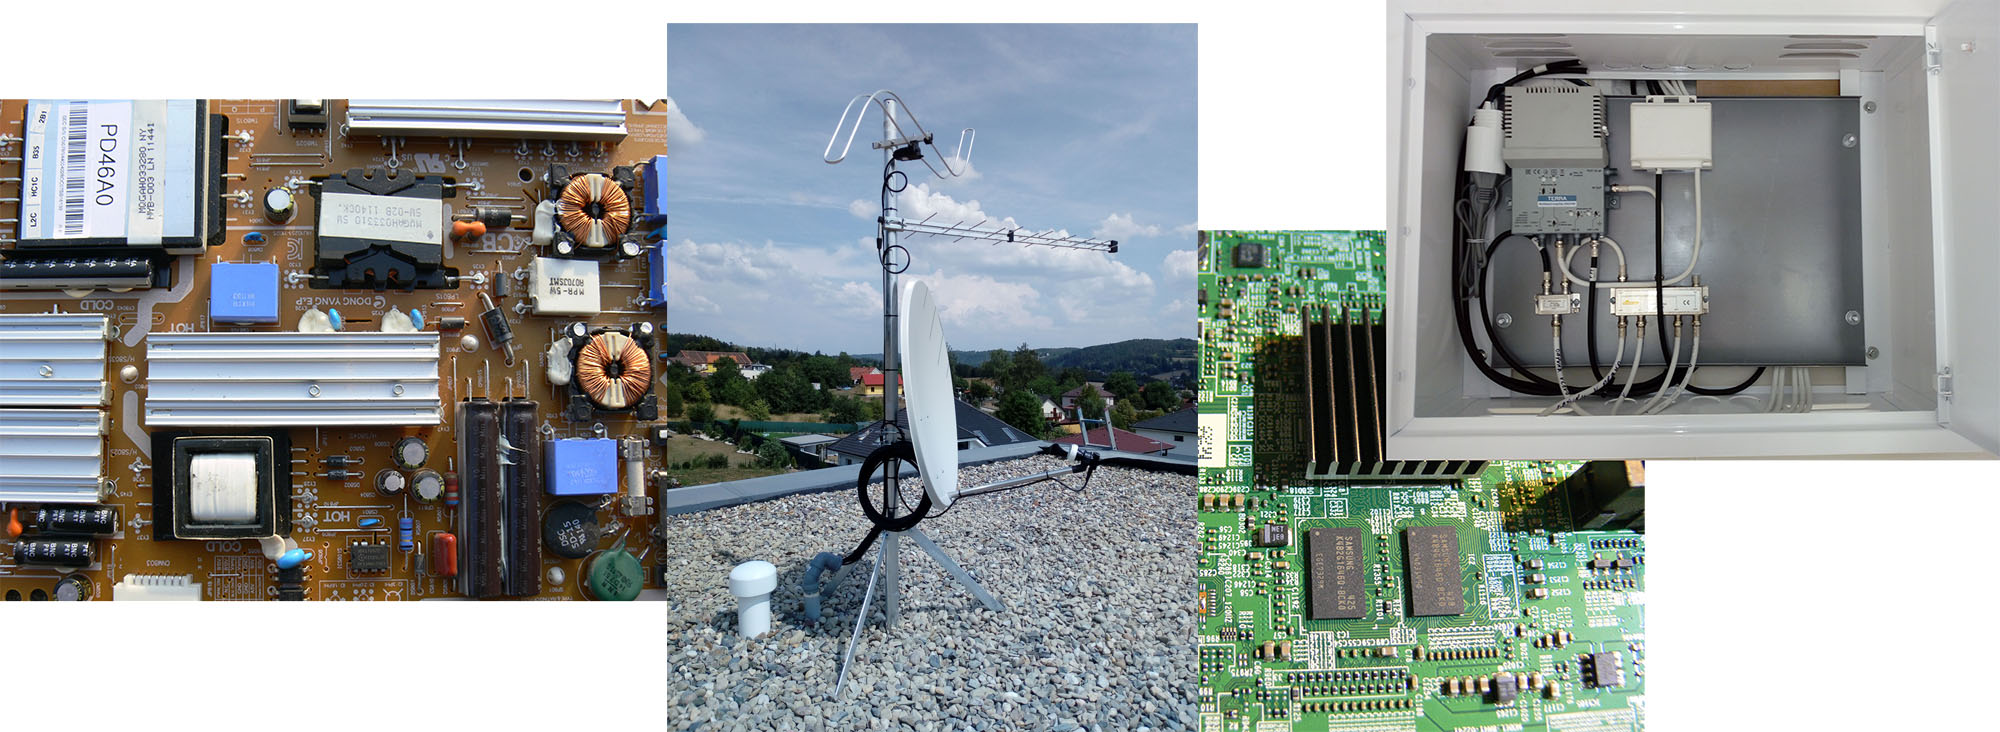 oprava servis anten satelitu tv